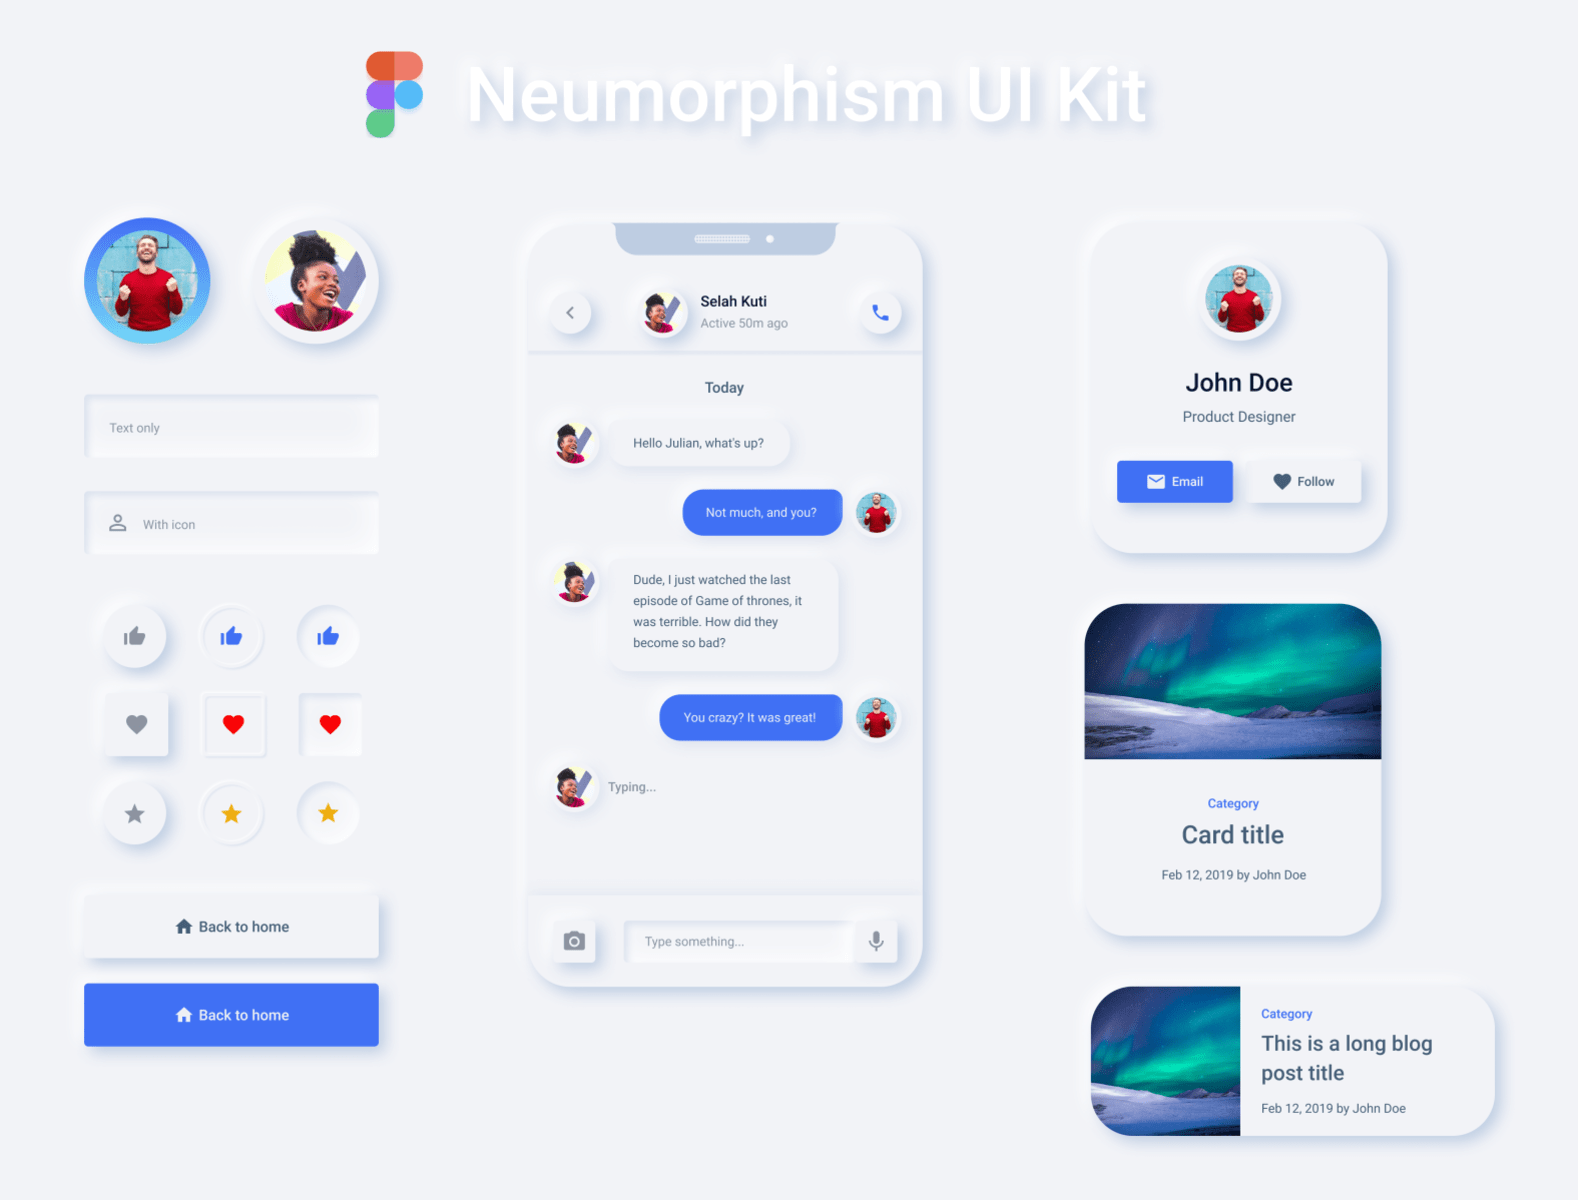 Neumorphism-UI-Kit - 43+ BEST FREE Neumorphism UI Design SAMPLE